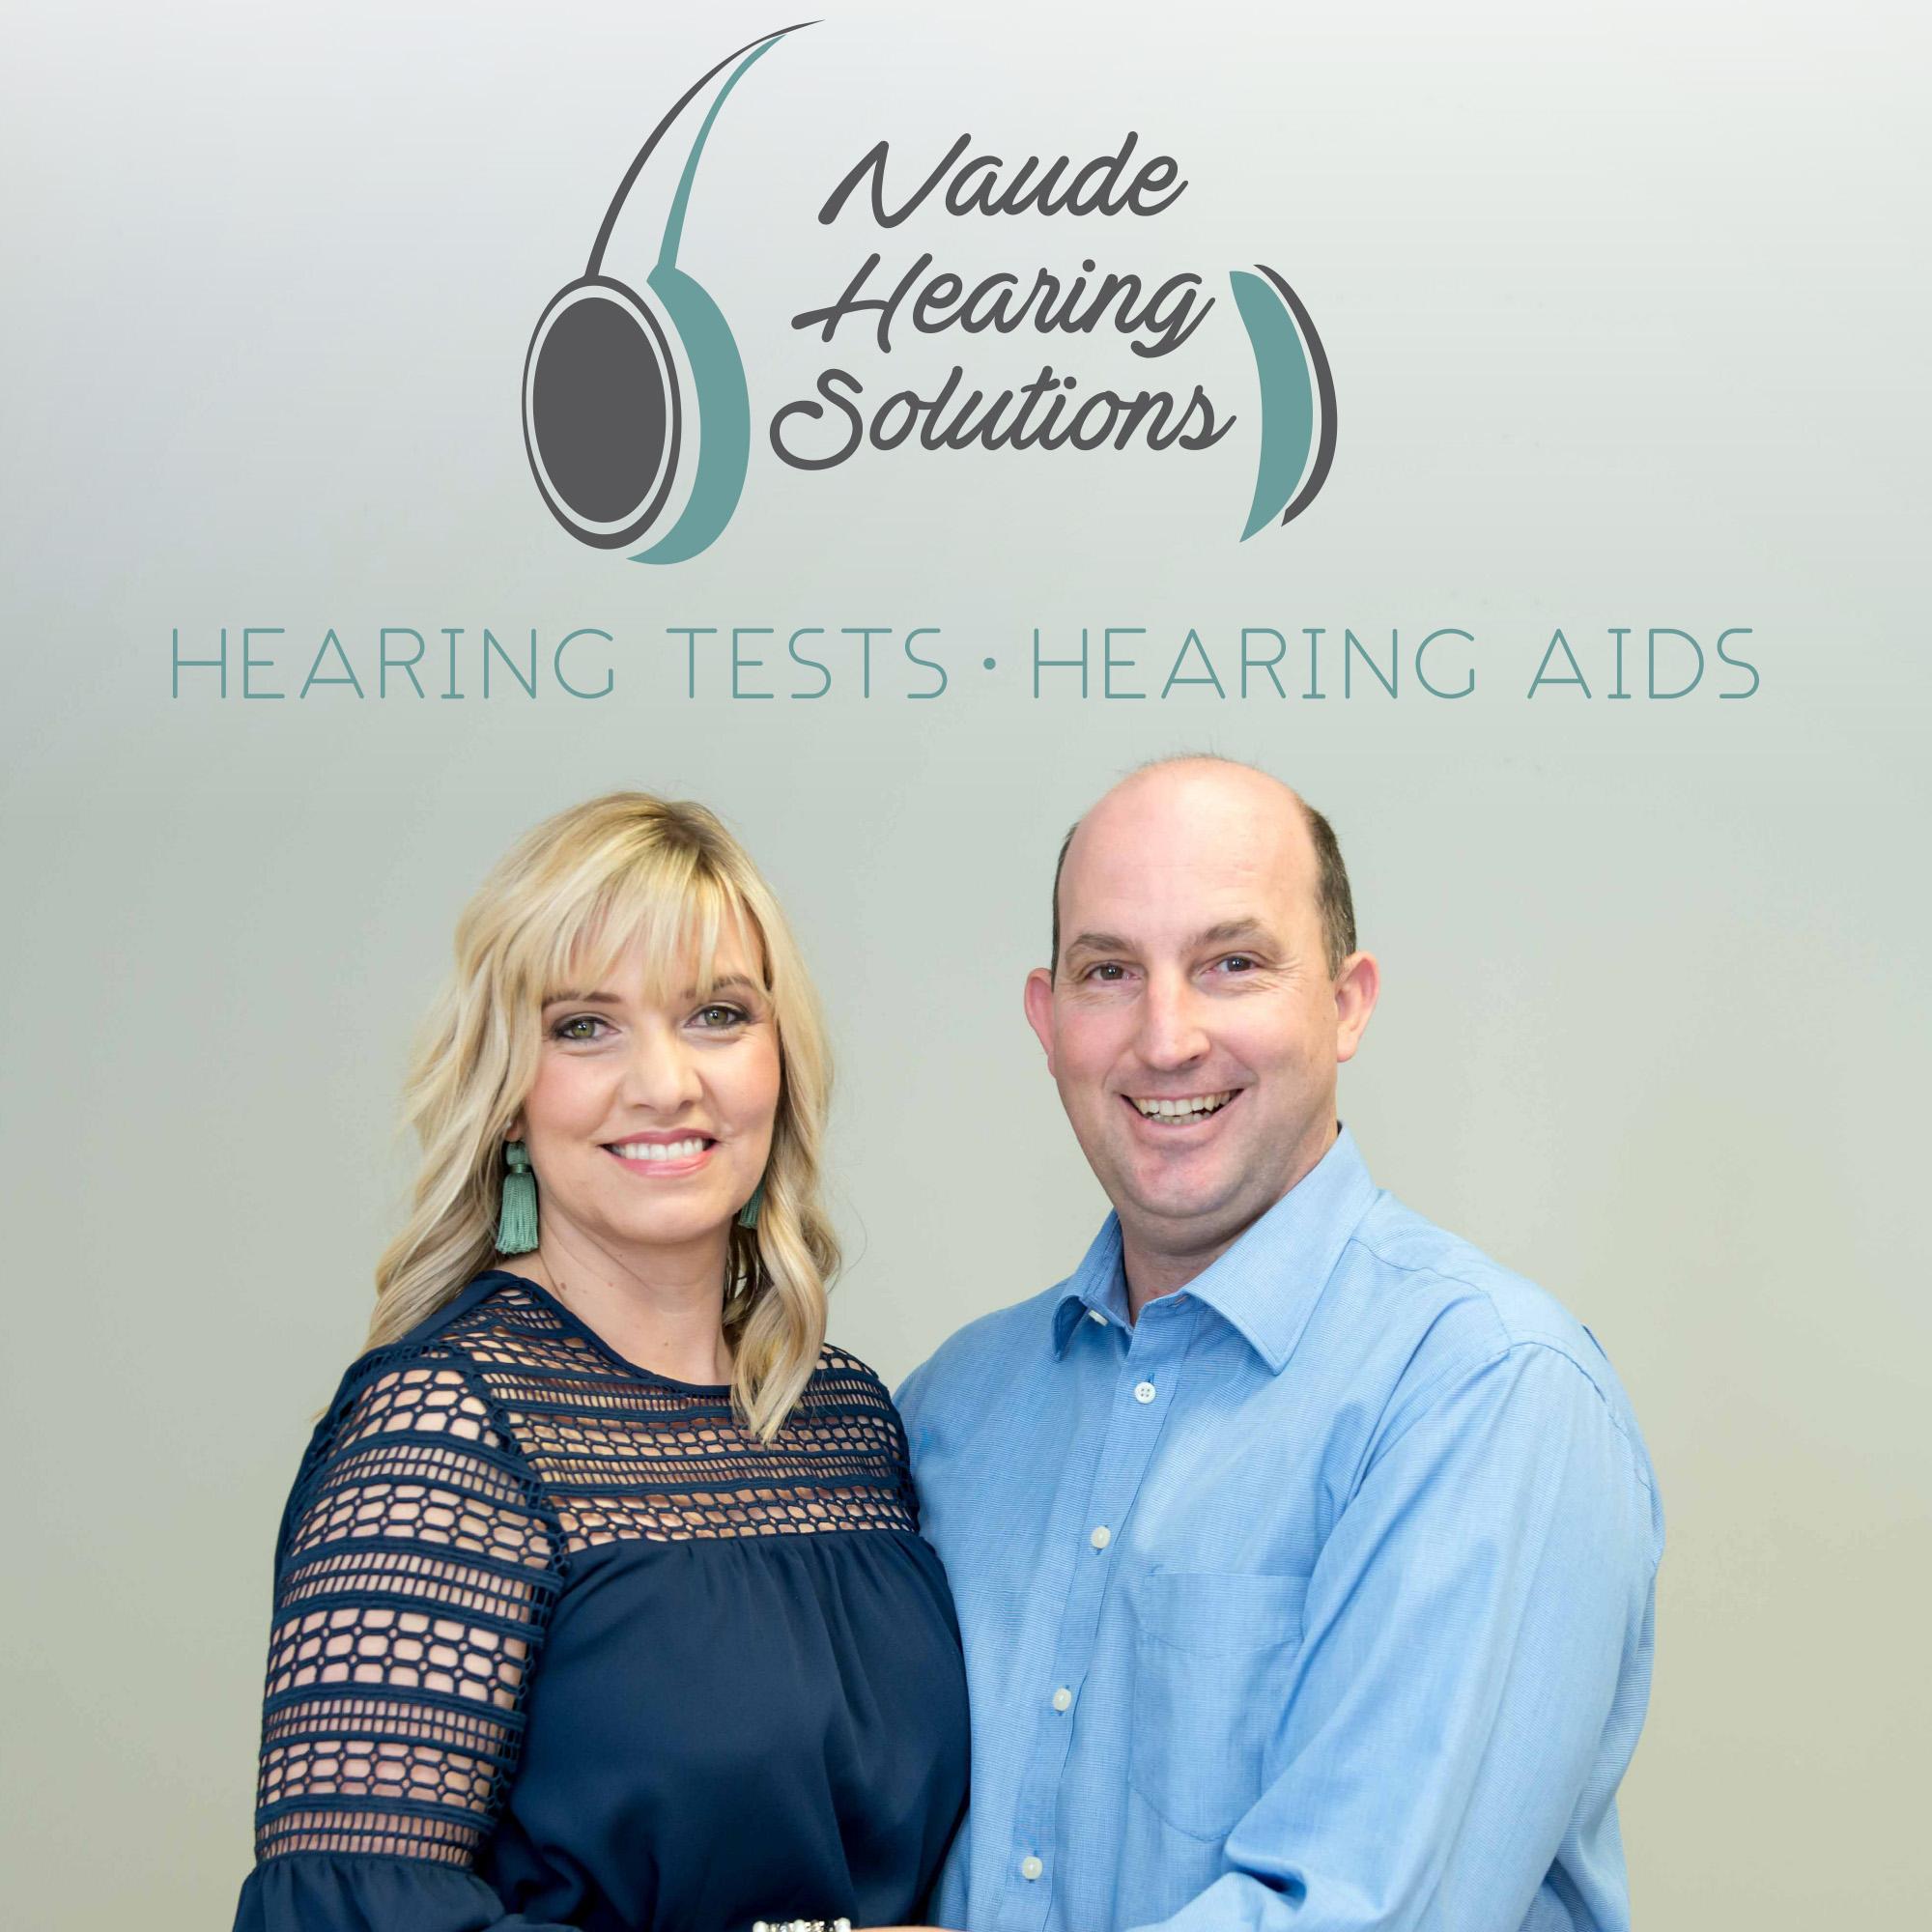 Naude Hearing Solutions - Hearing Tests - Hearing Aids